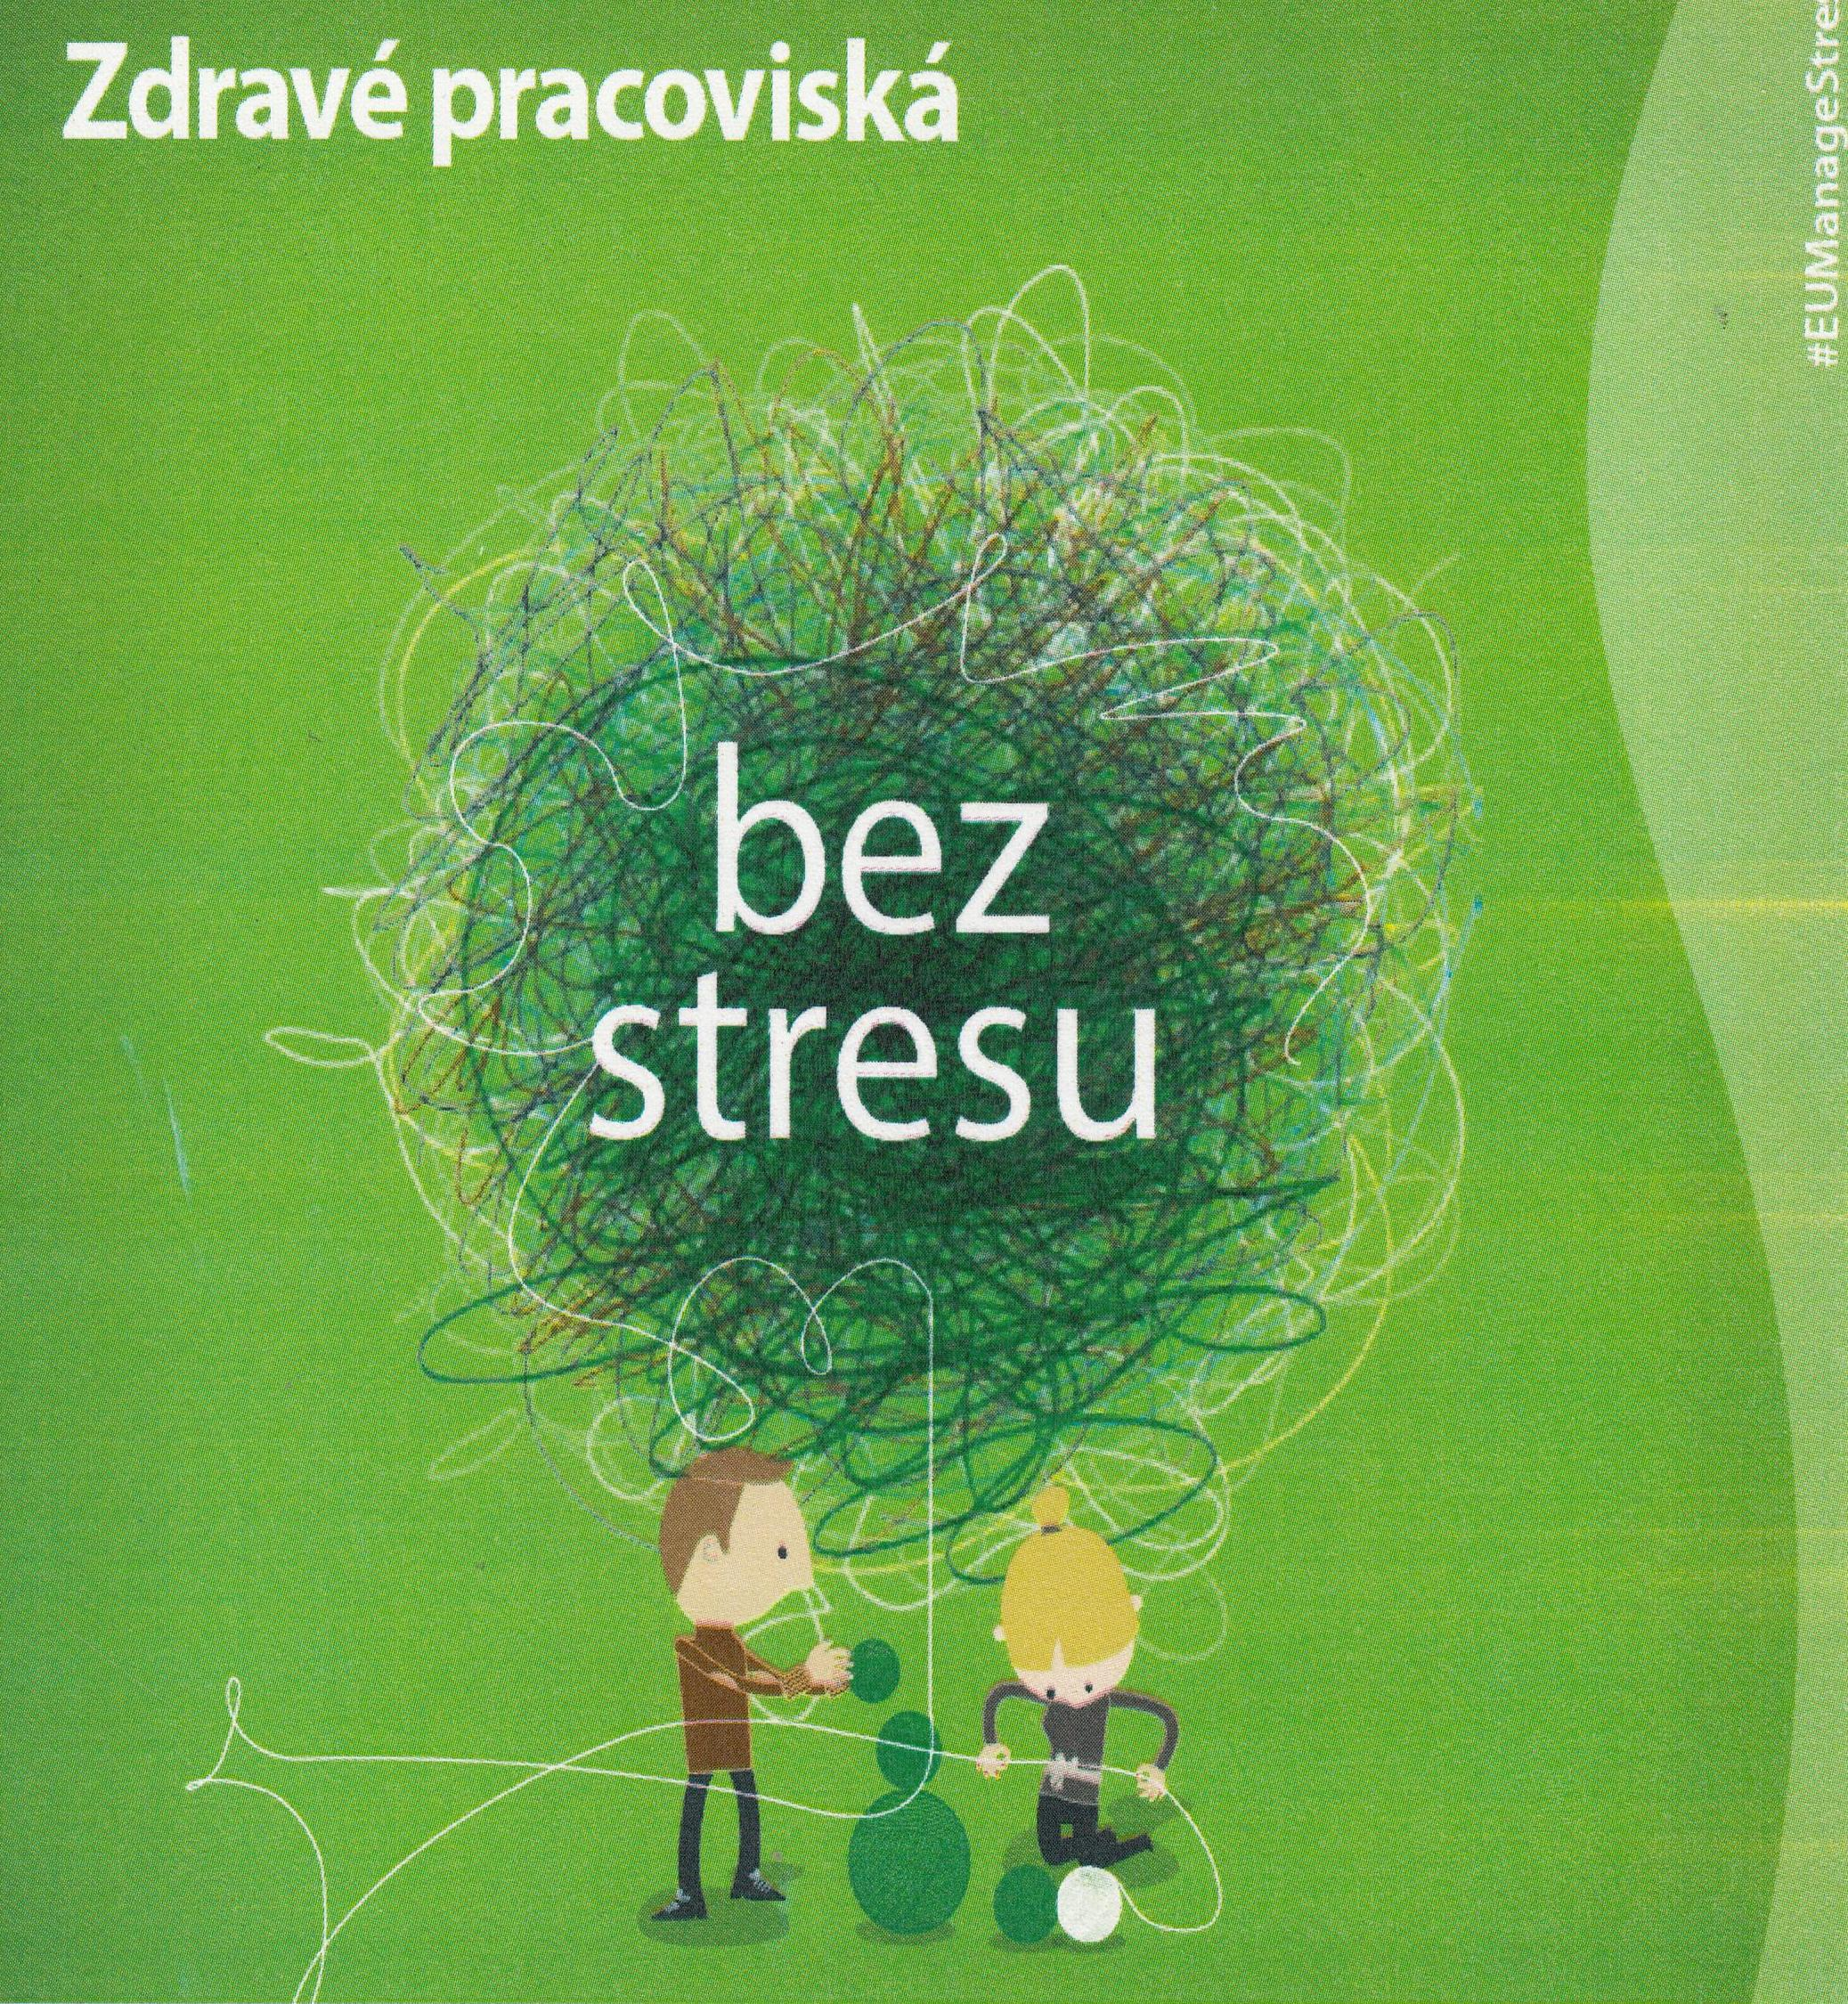 antistresok